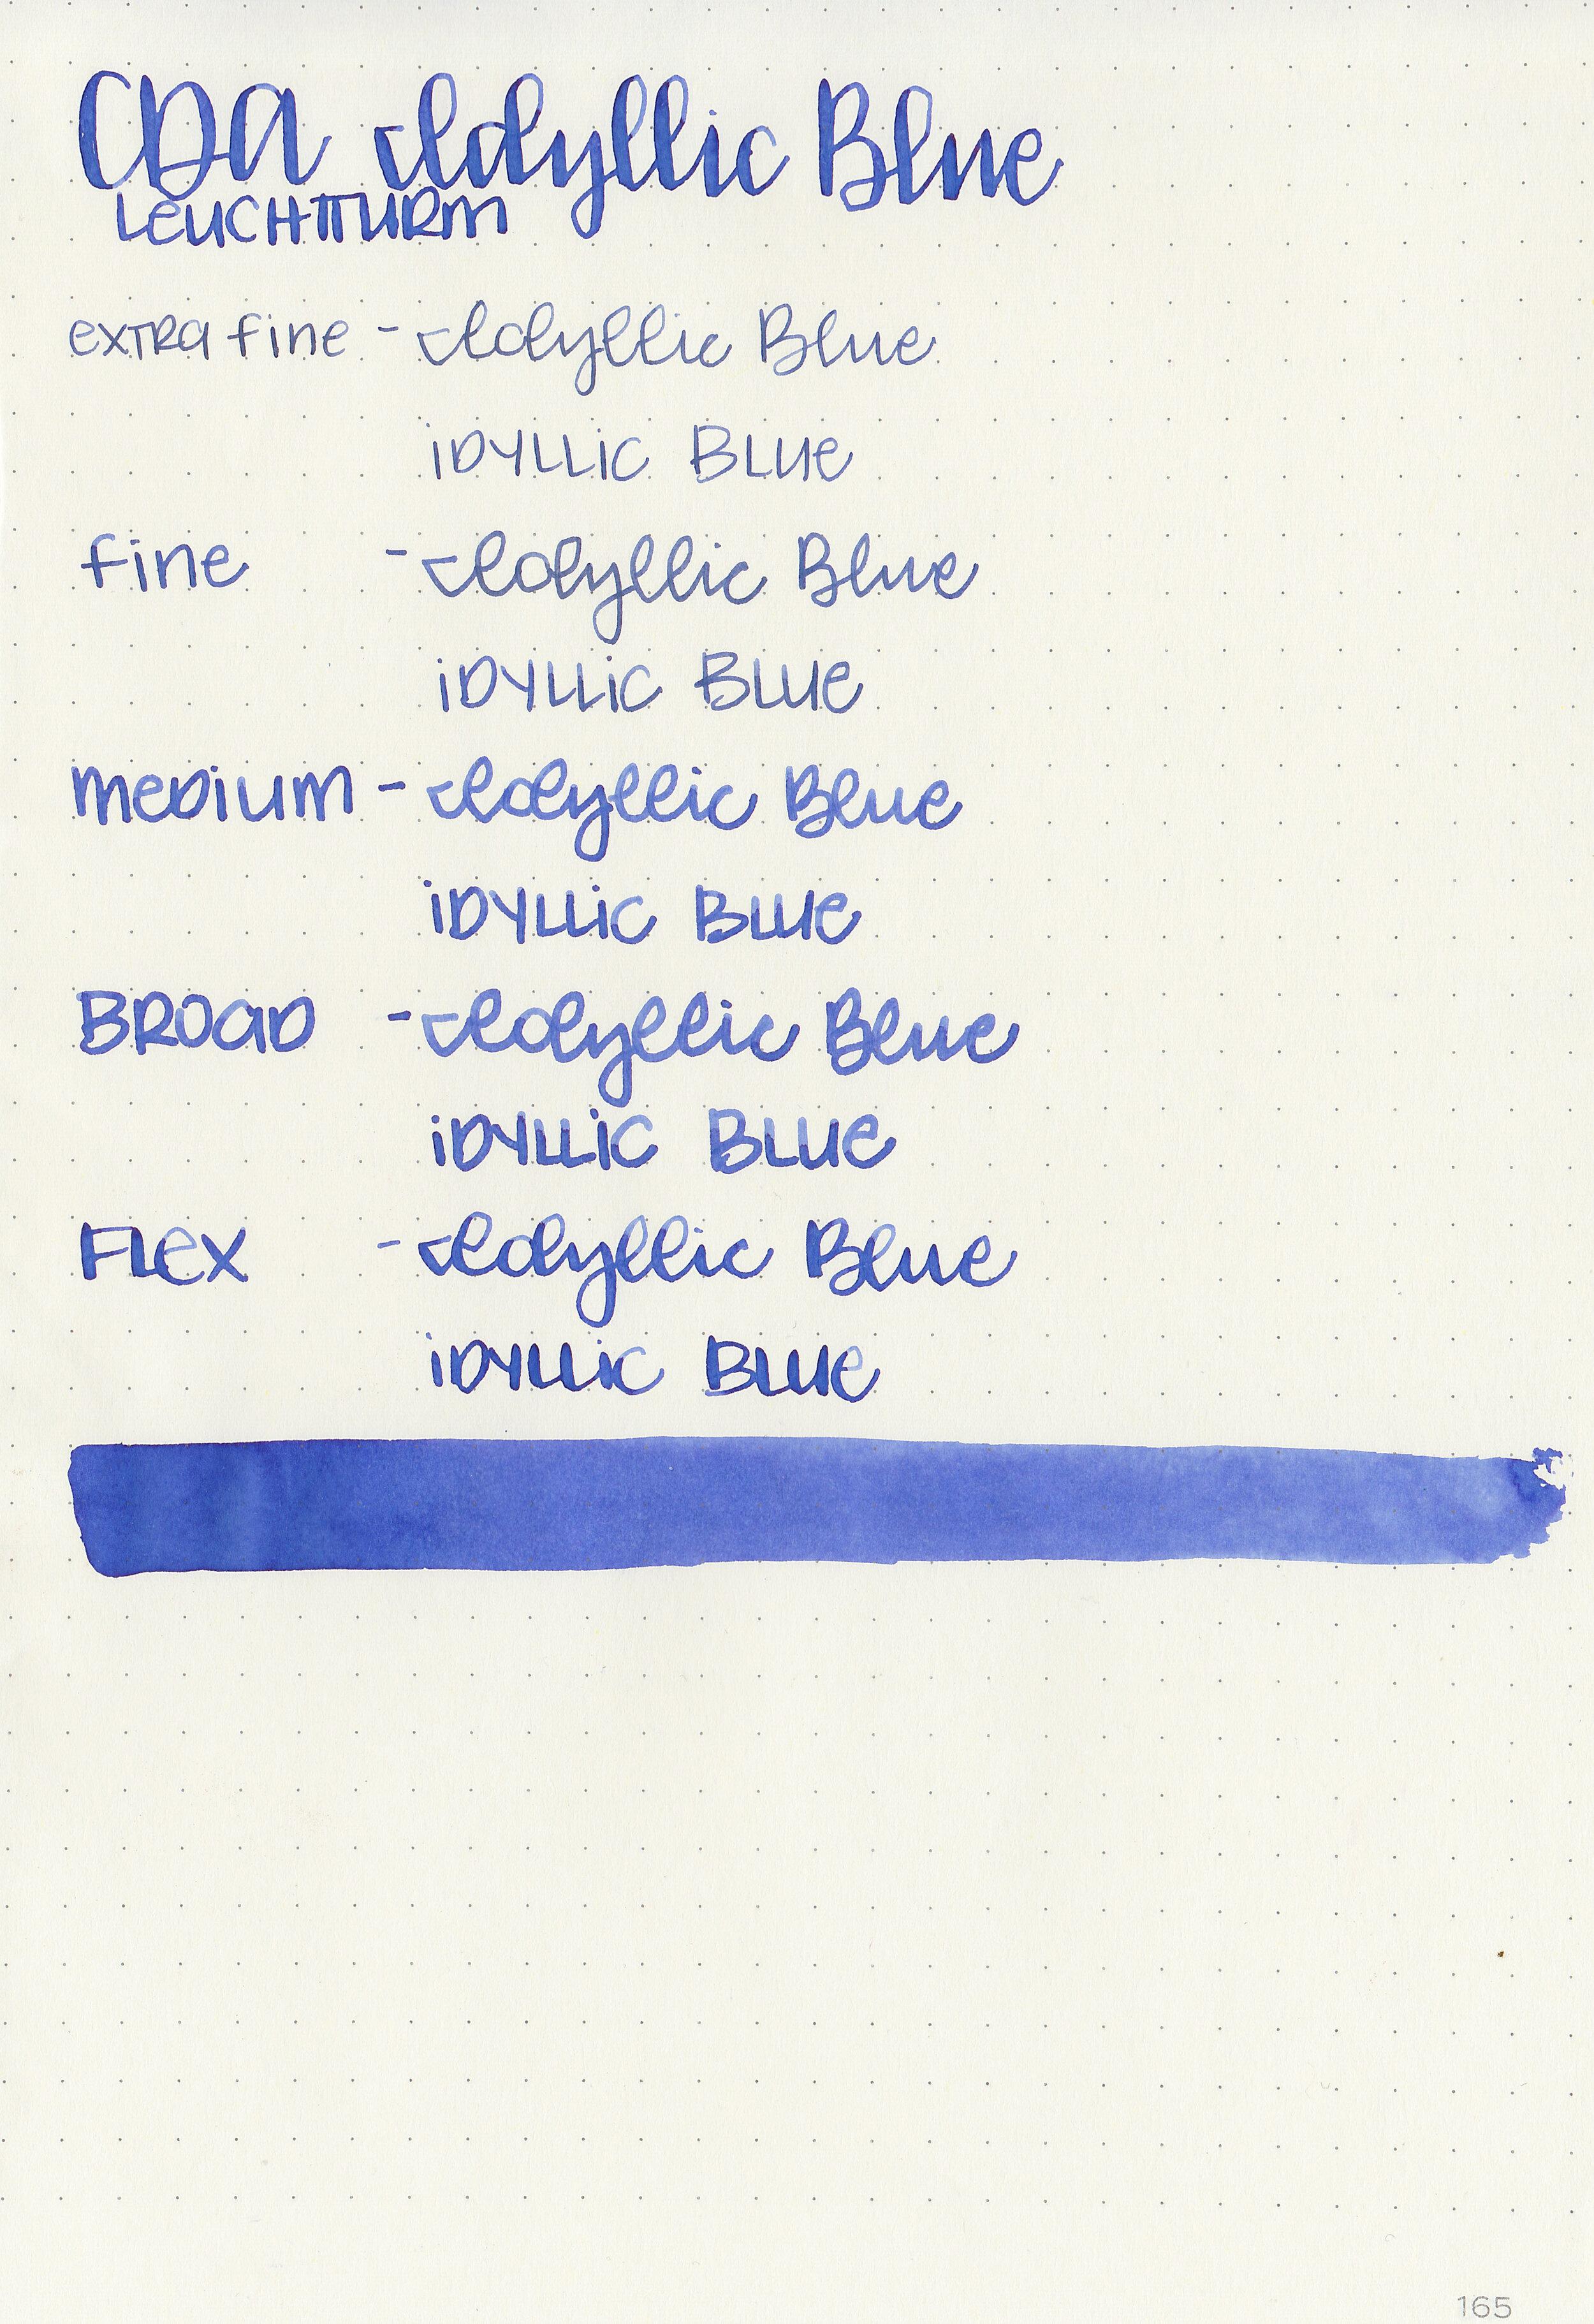 cda-idyllic-blue-9.jpg